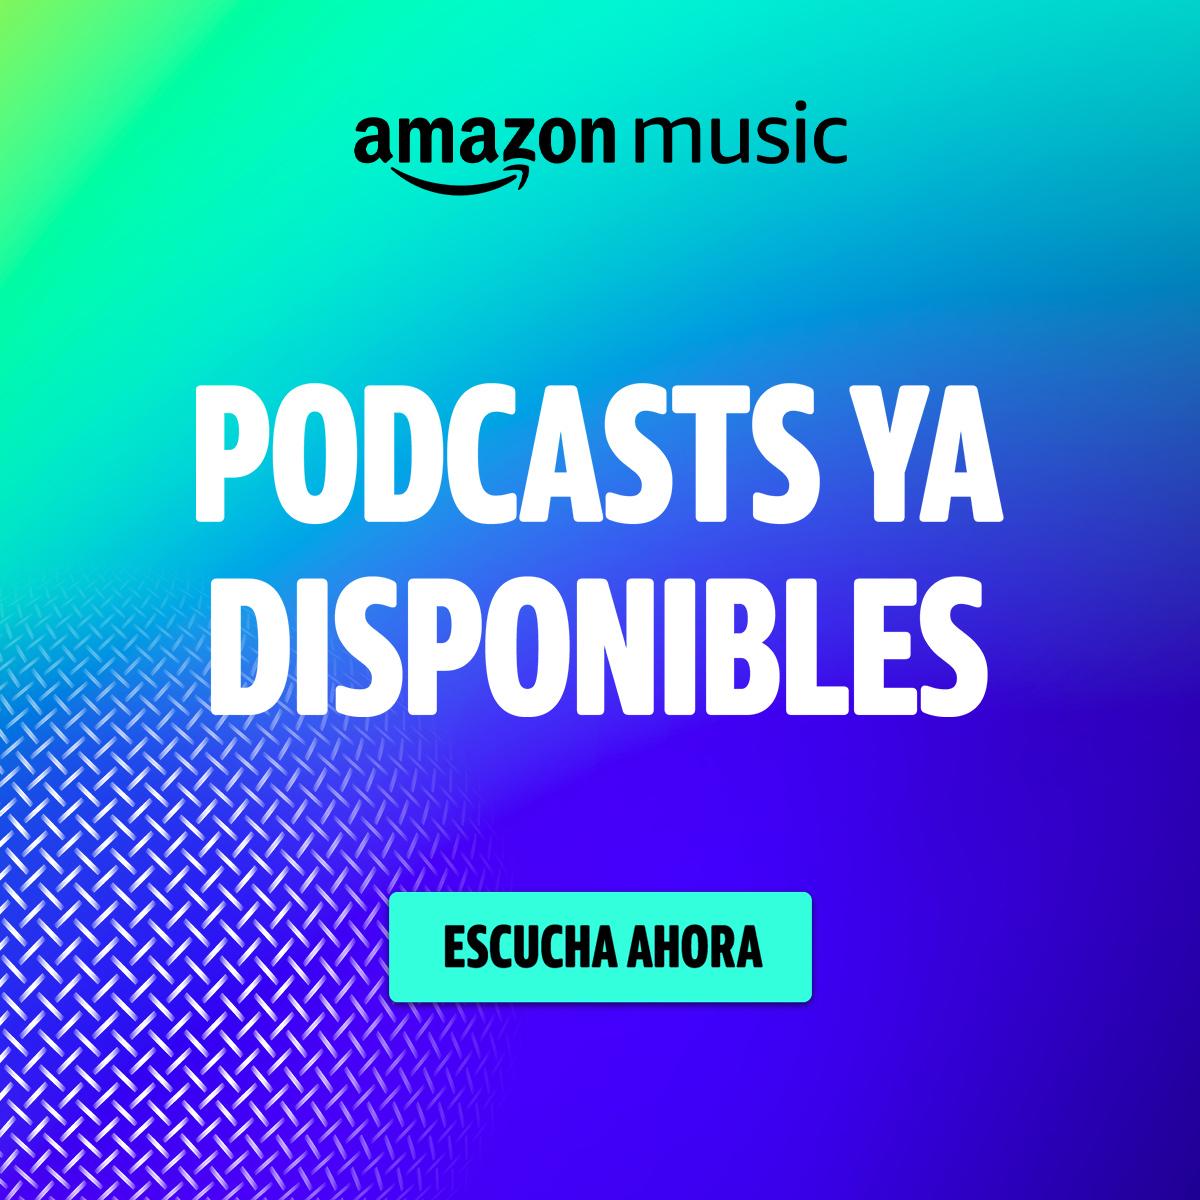 Podcasts ya Disponibles en Amazon Music